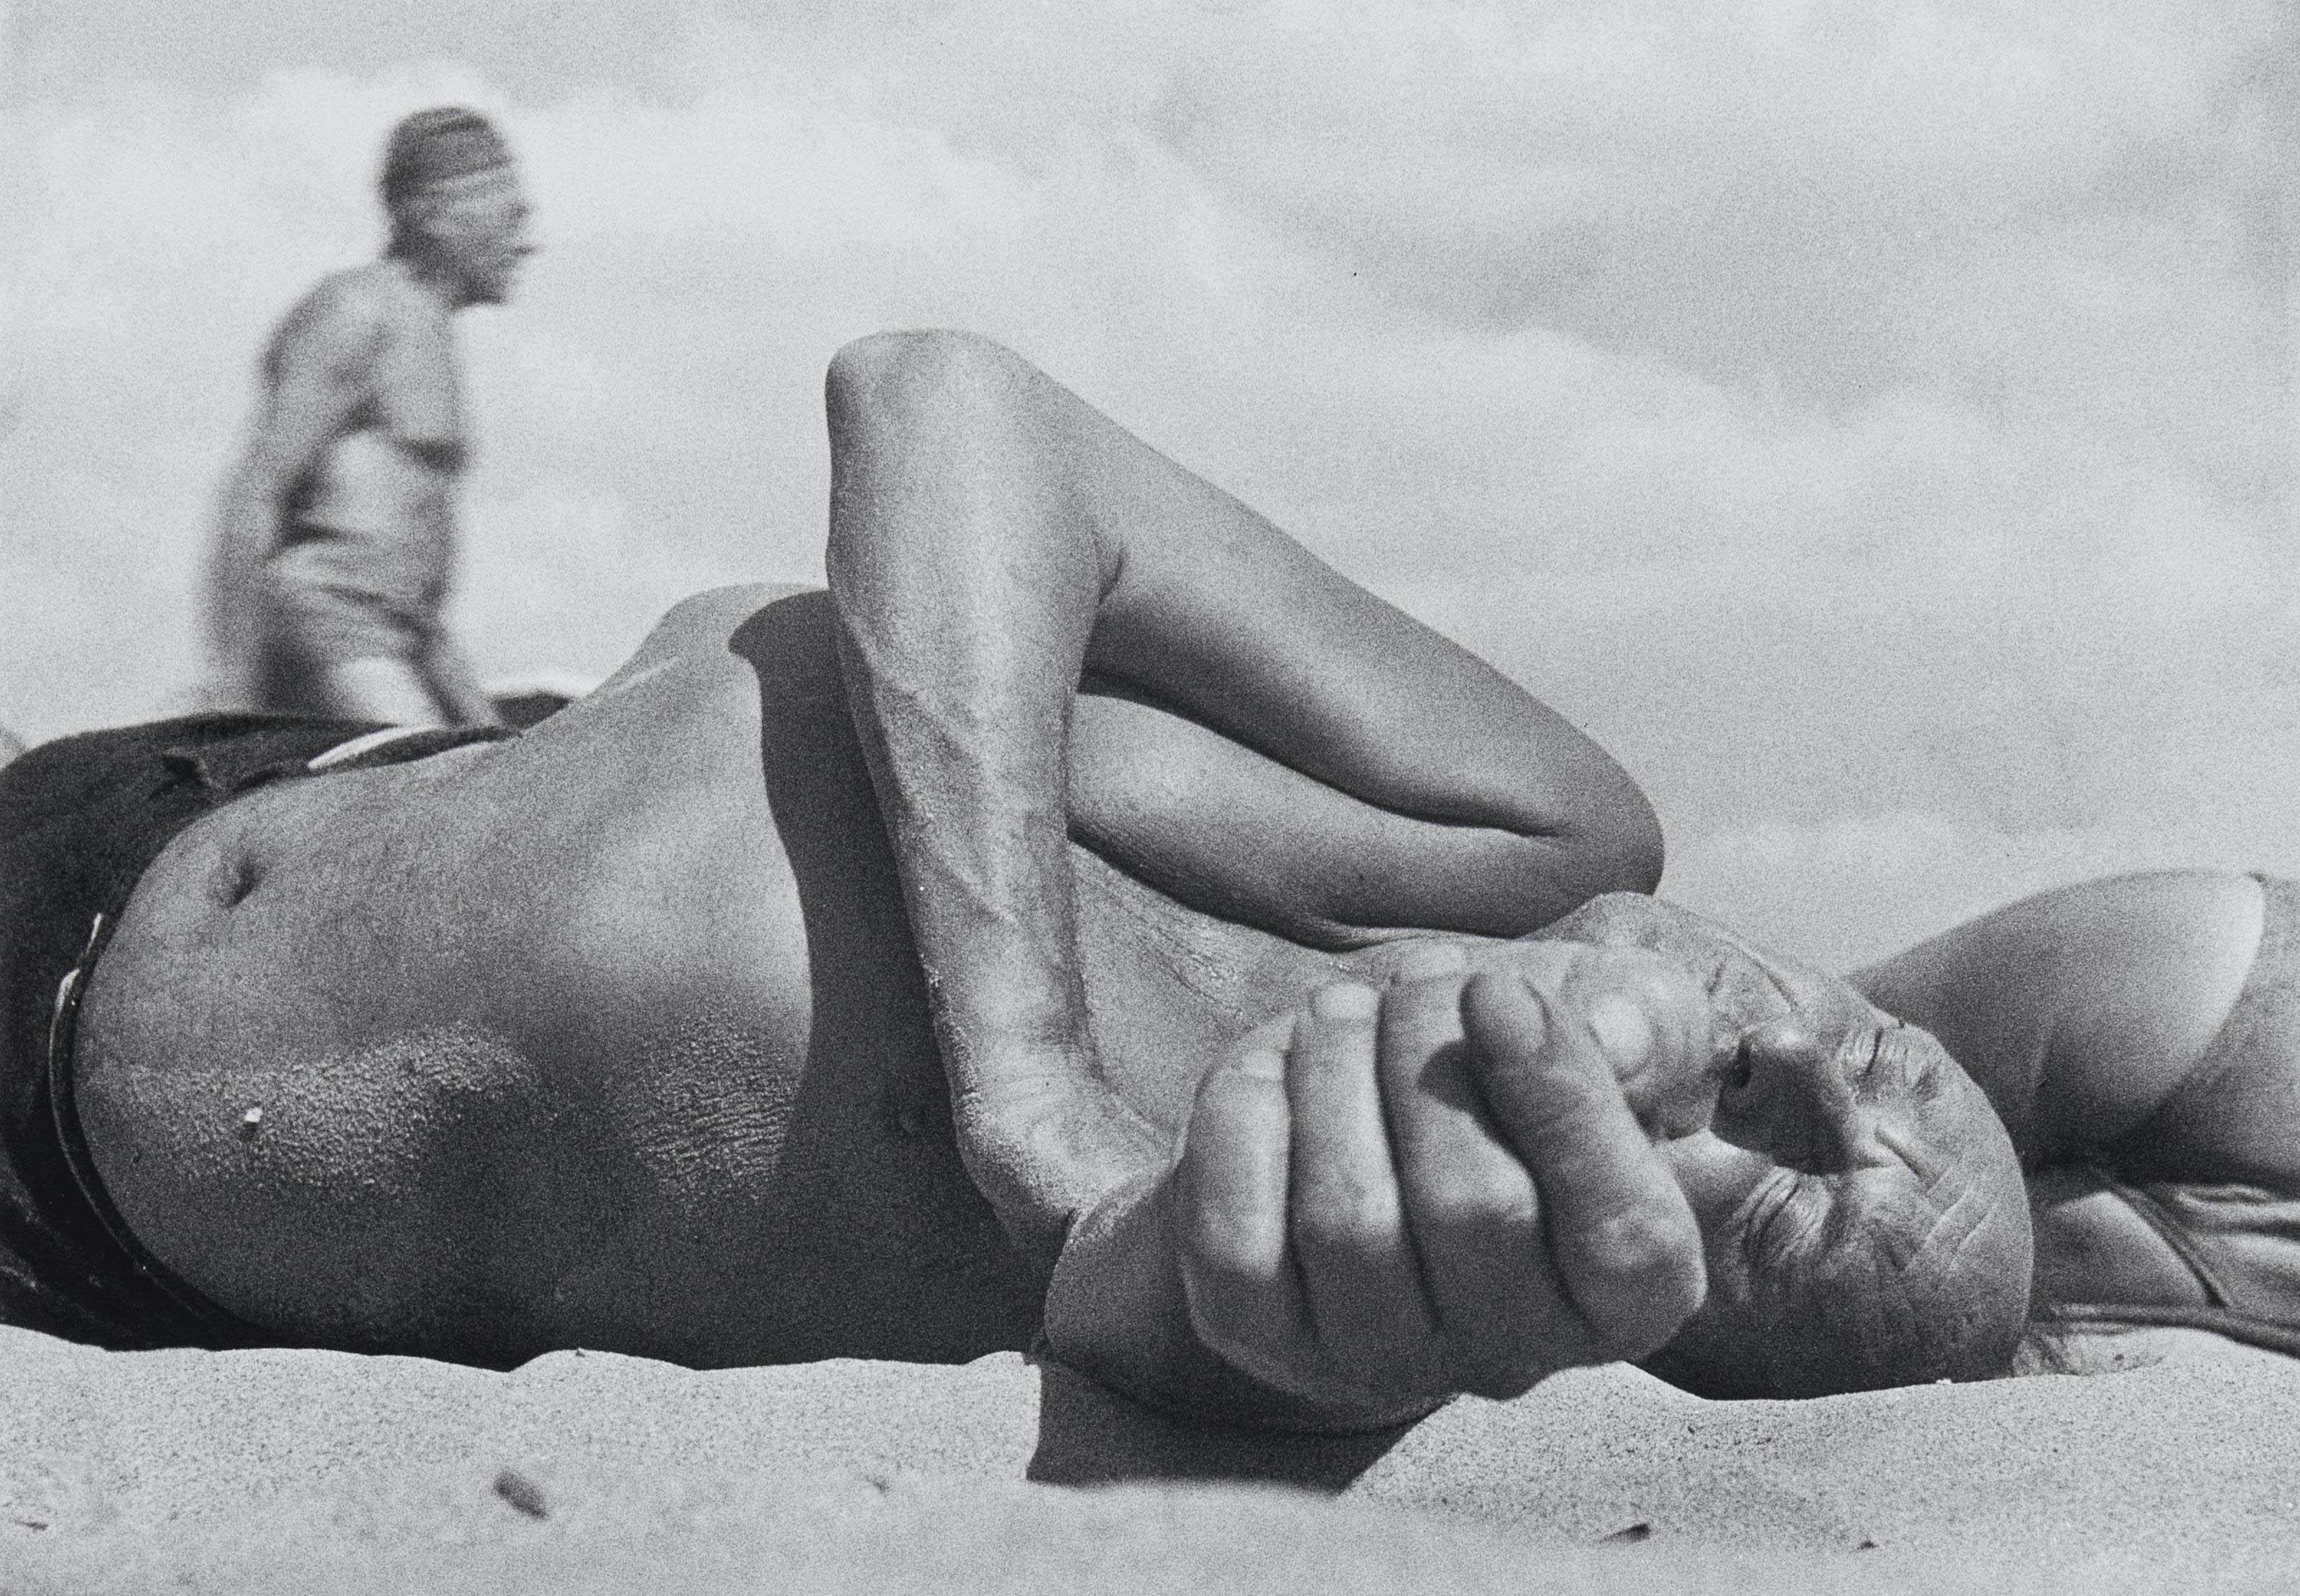 Coney Island, 1956